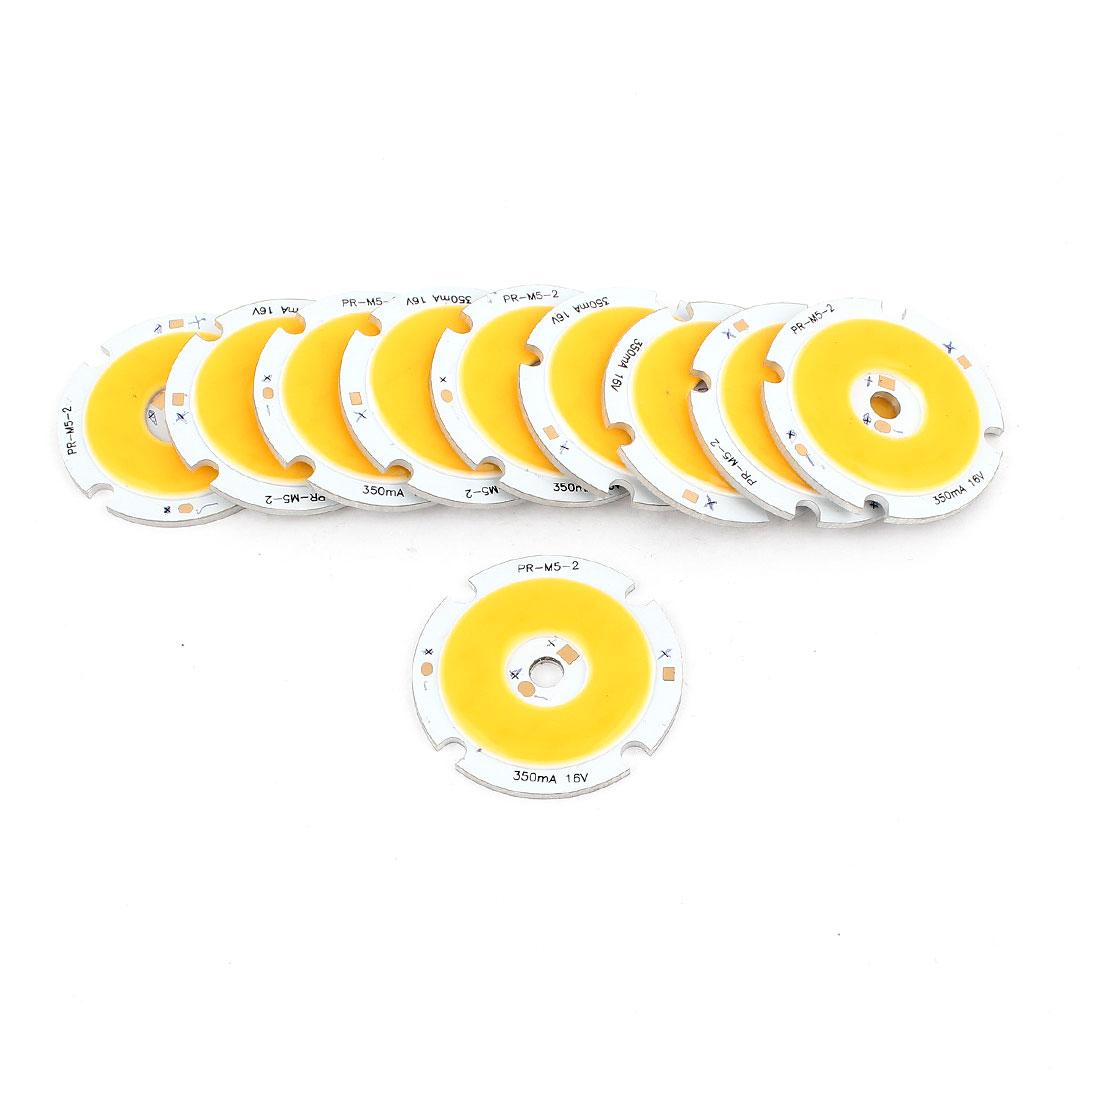 5W DC5-18V 300mA 80-90LM/W Warm White LED Light COB Lamp Bead Chip 10pcs